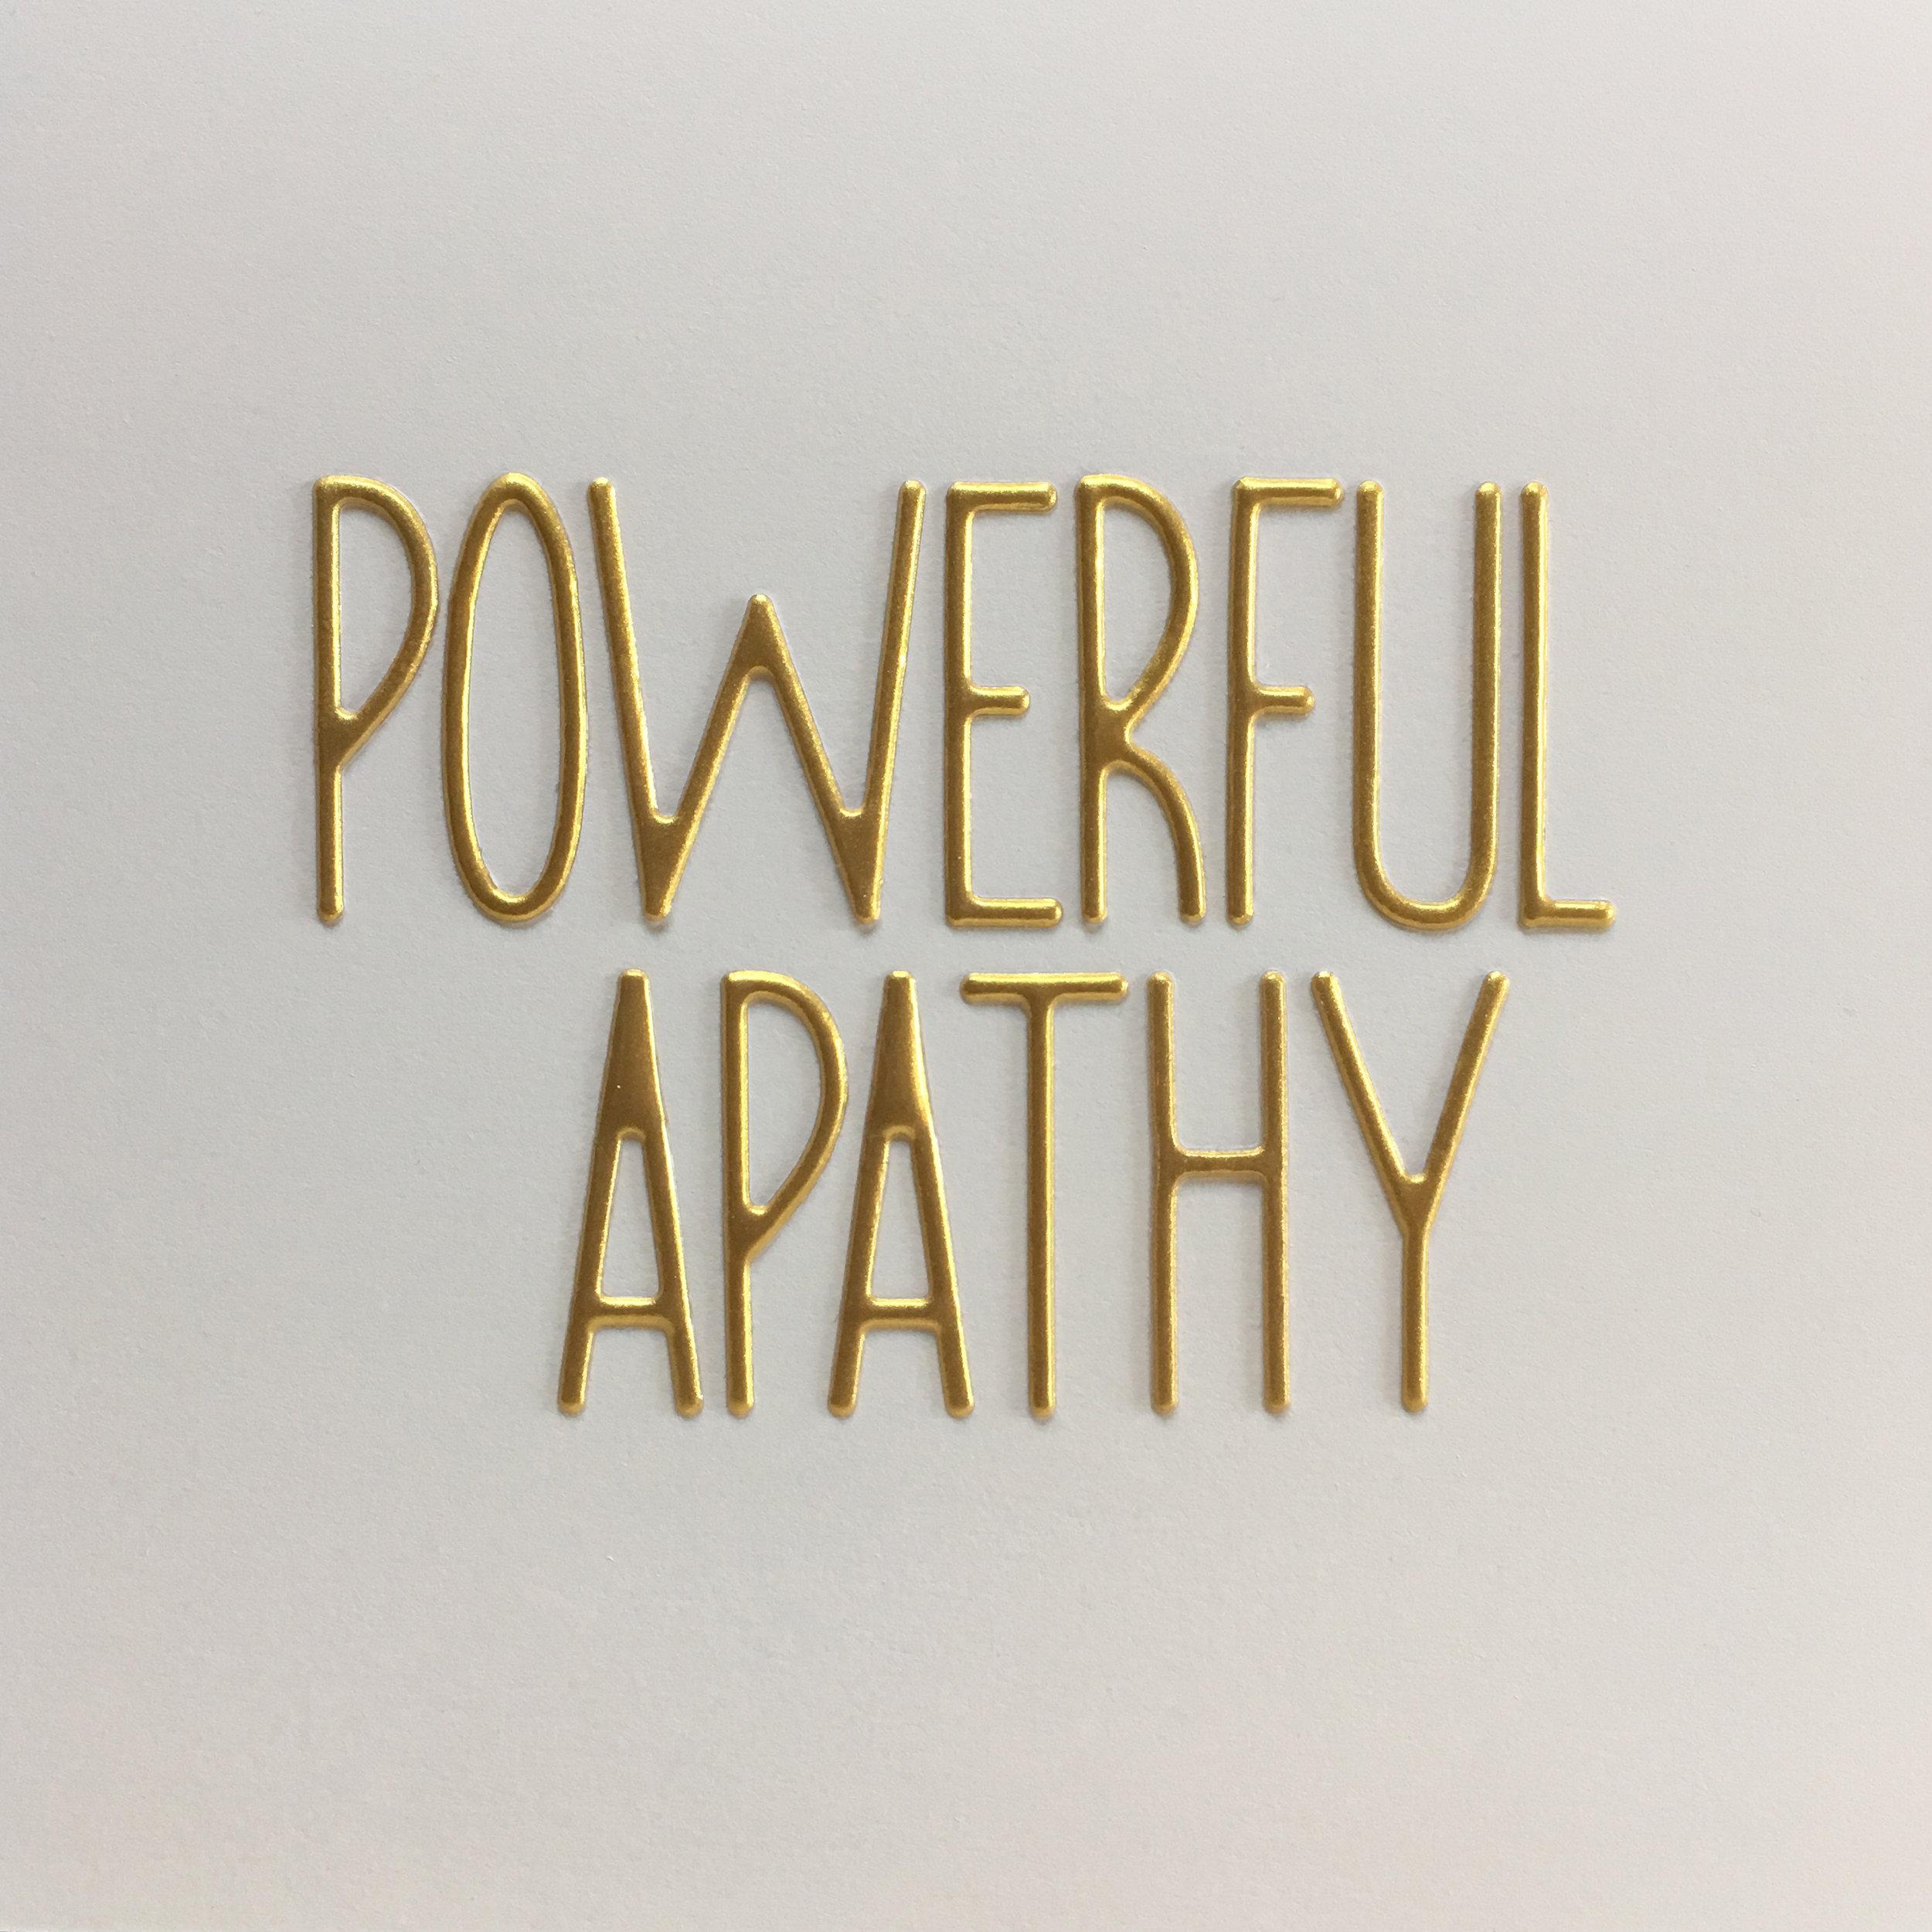 powerful apathy.jpg